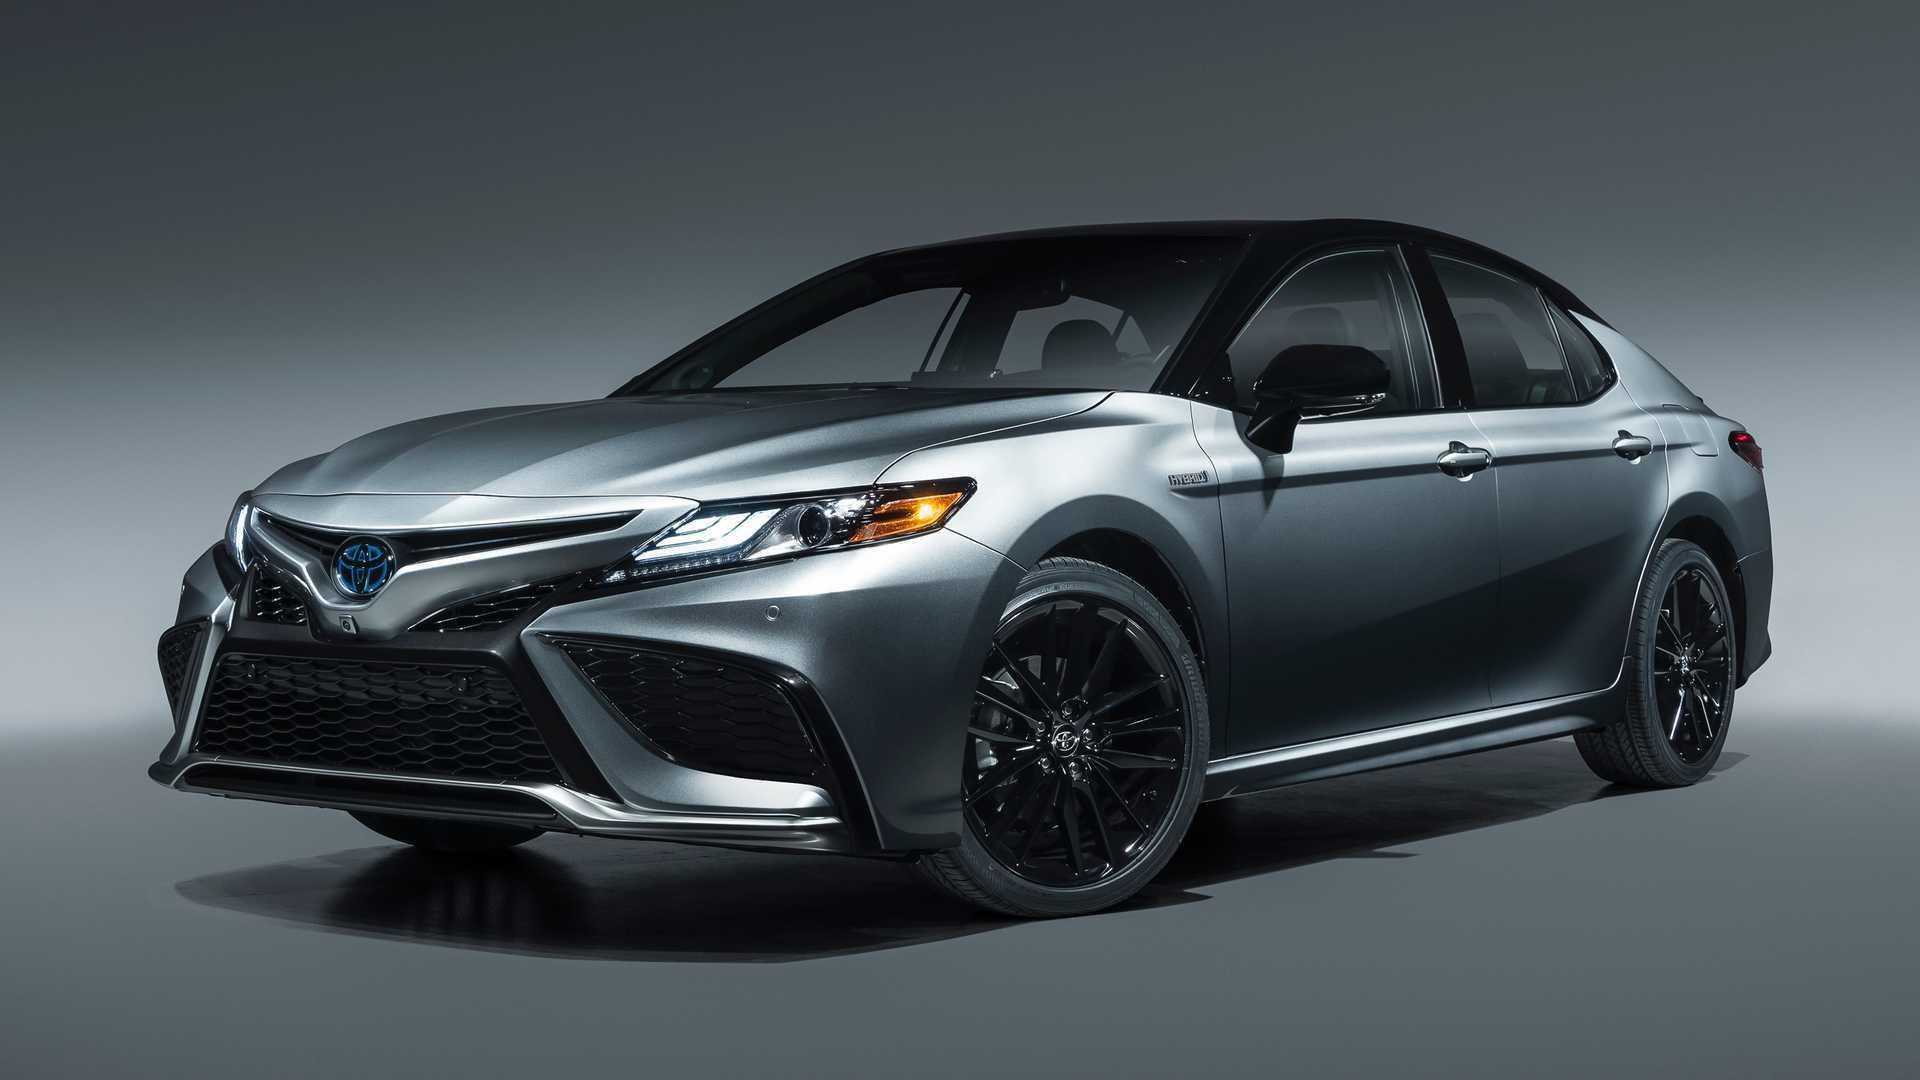 Kelebihan Sedan Toyota Murah Berkualitas